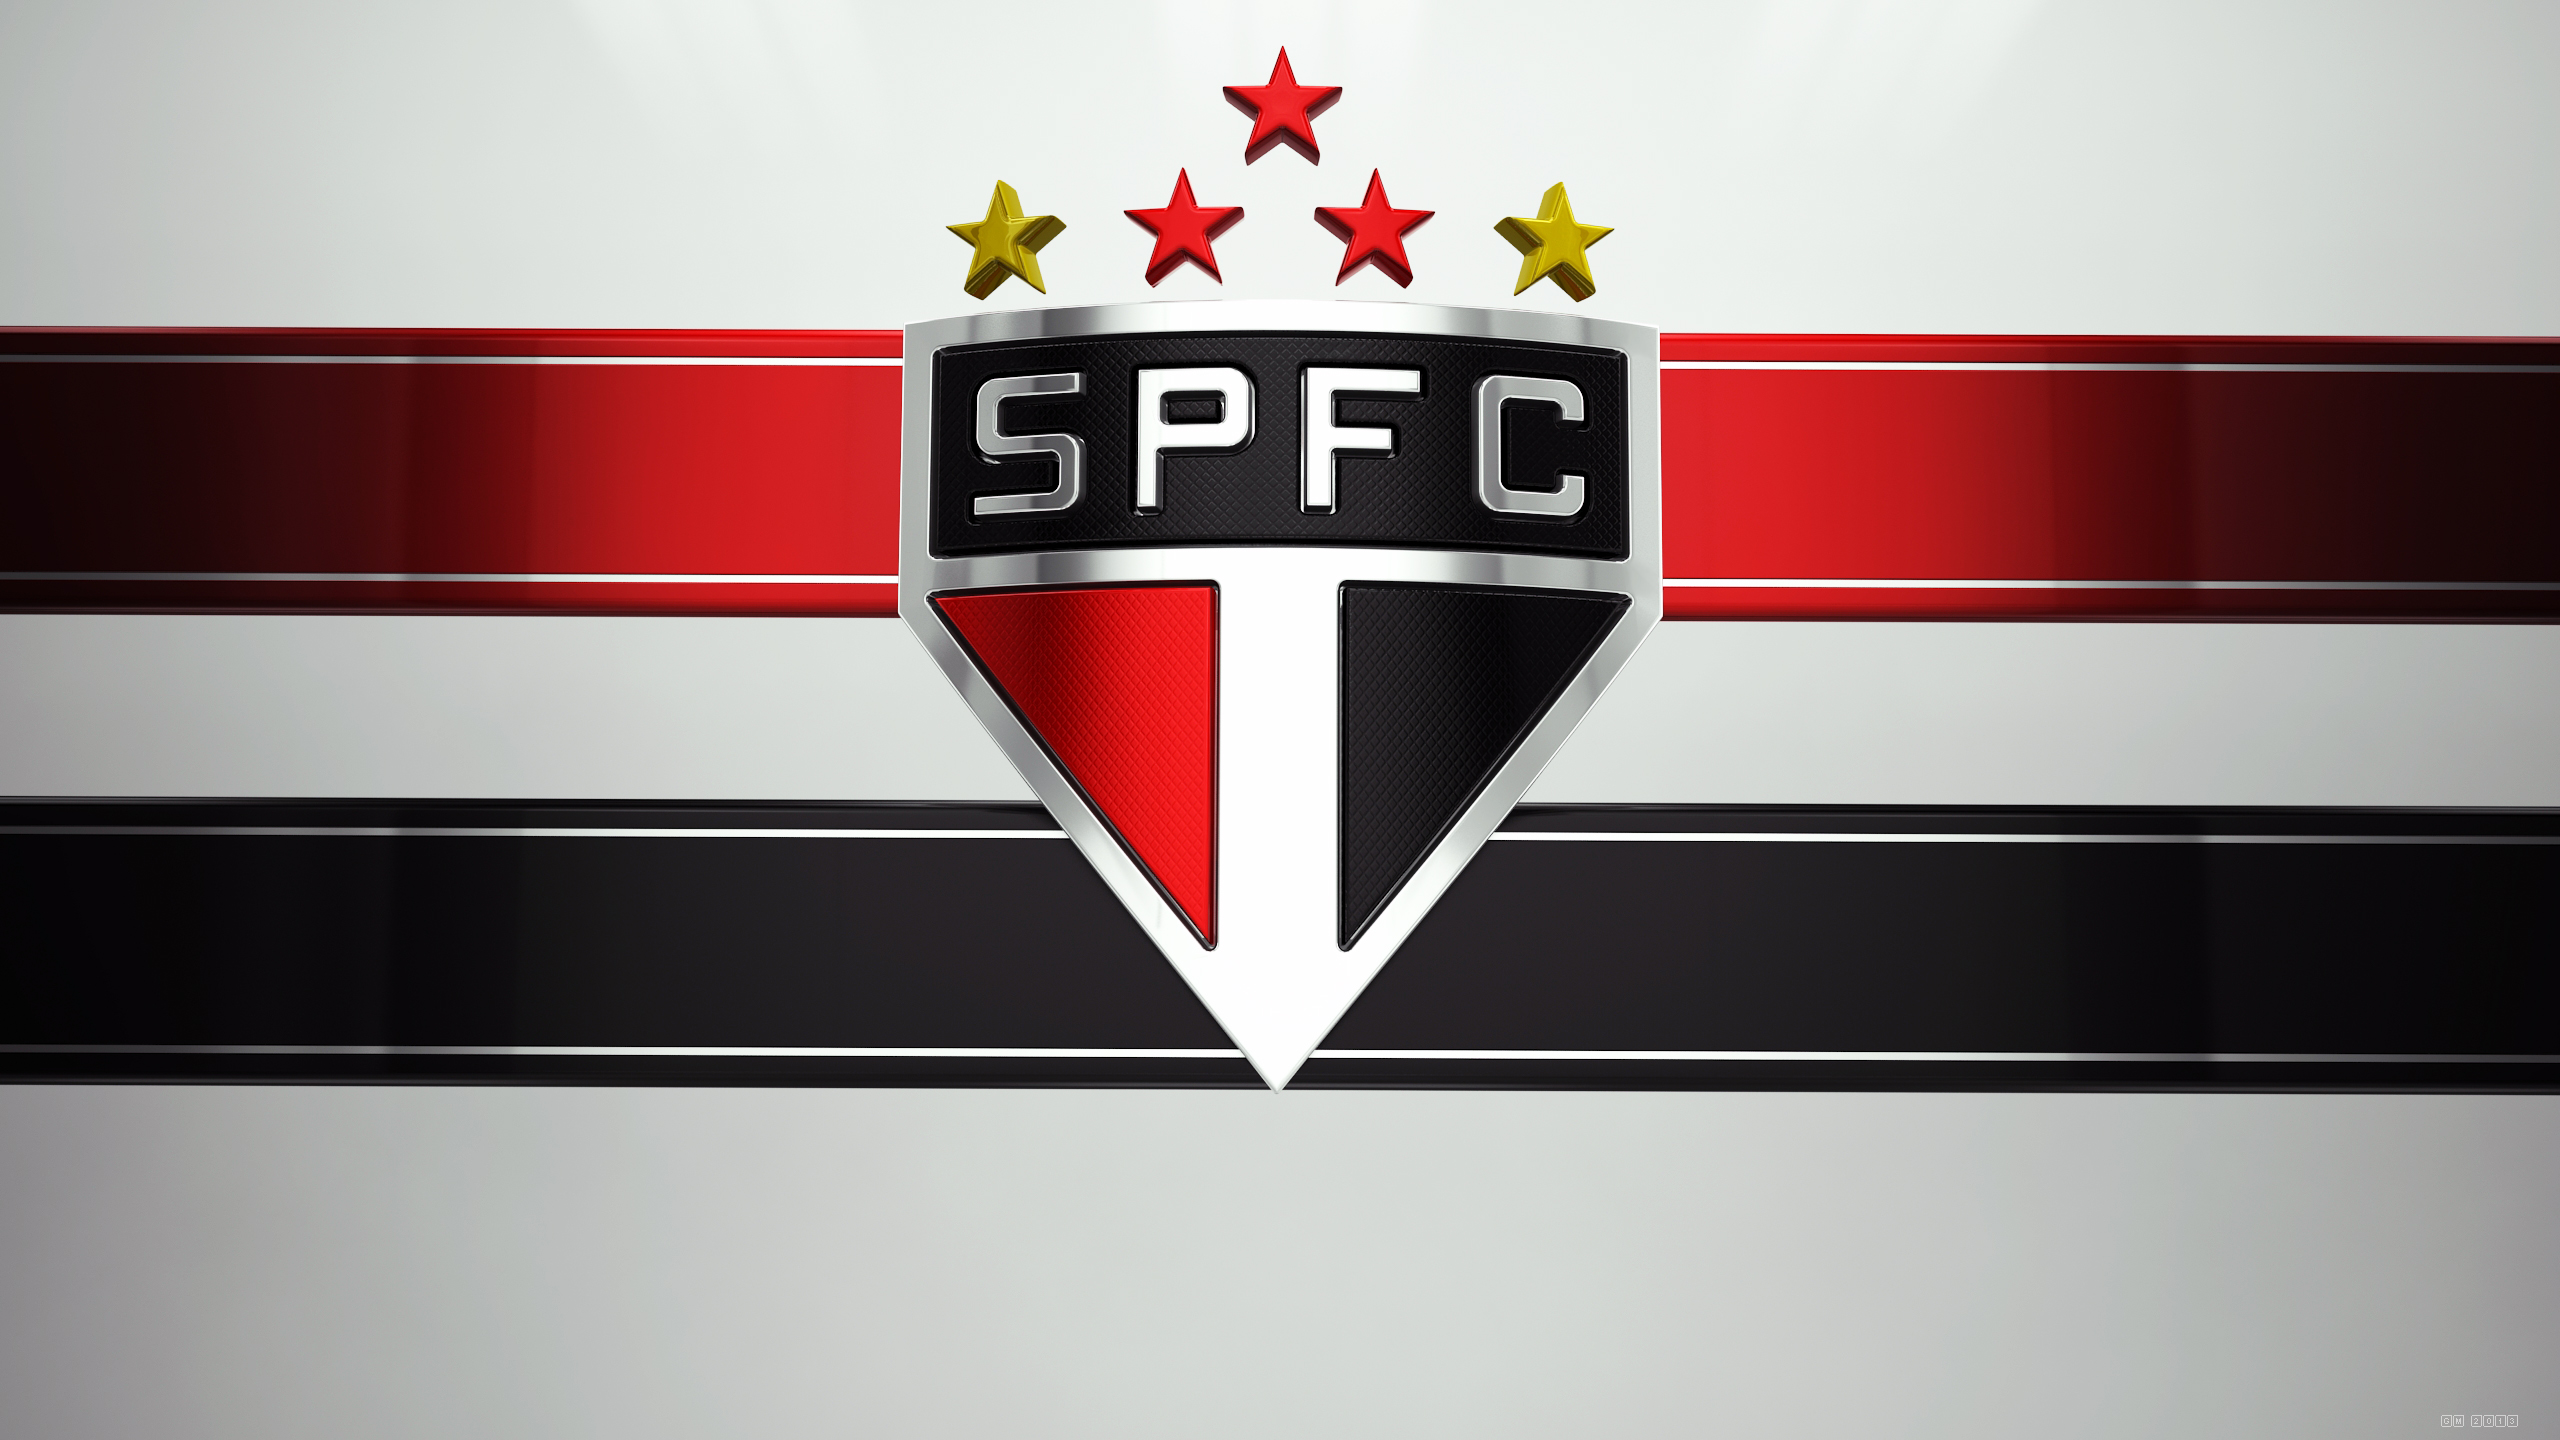 Sao Paulo FC Wallpaper 2   2560 X 1440 stmednet 2560x1440